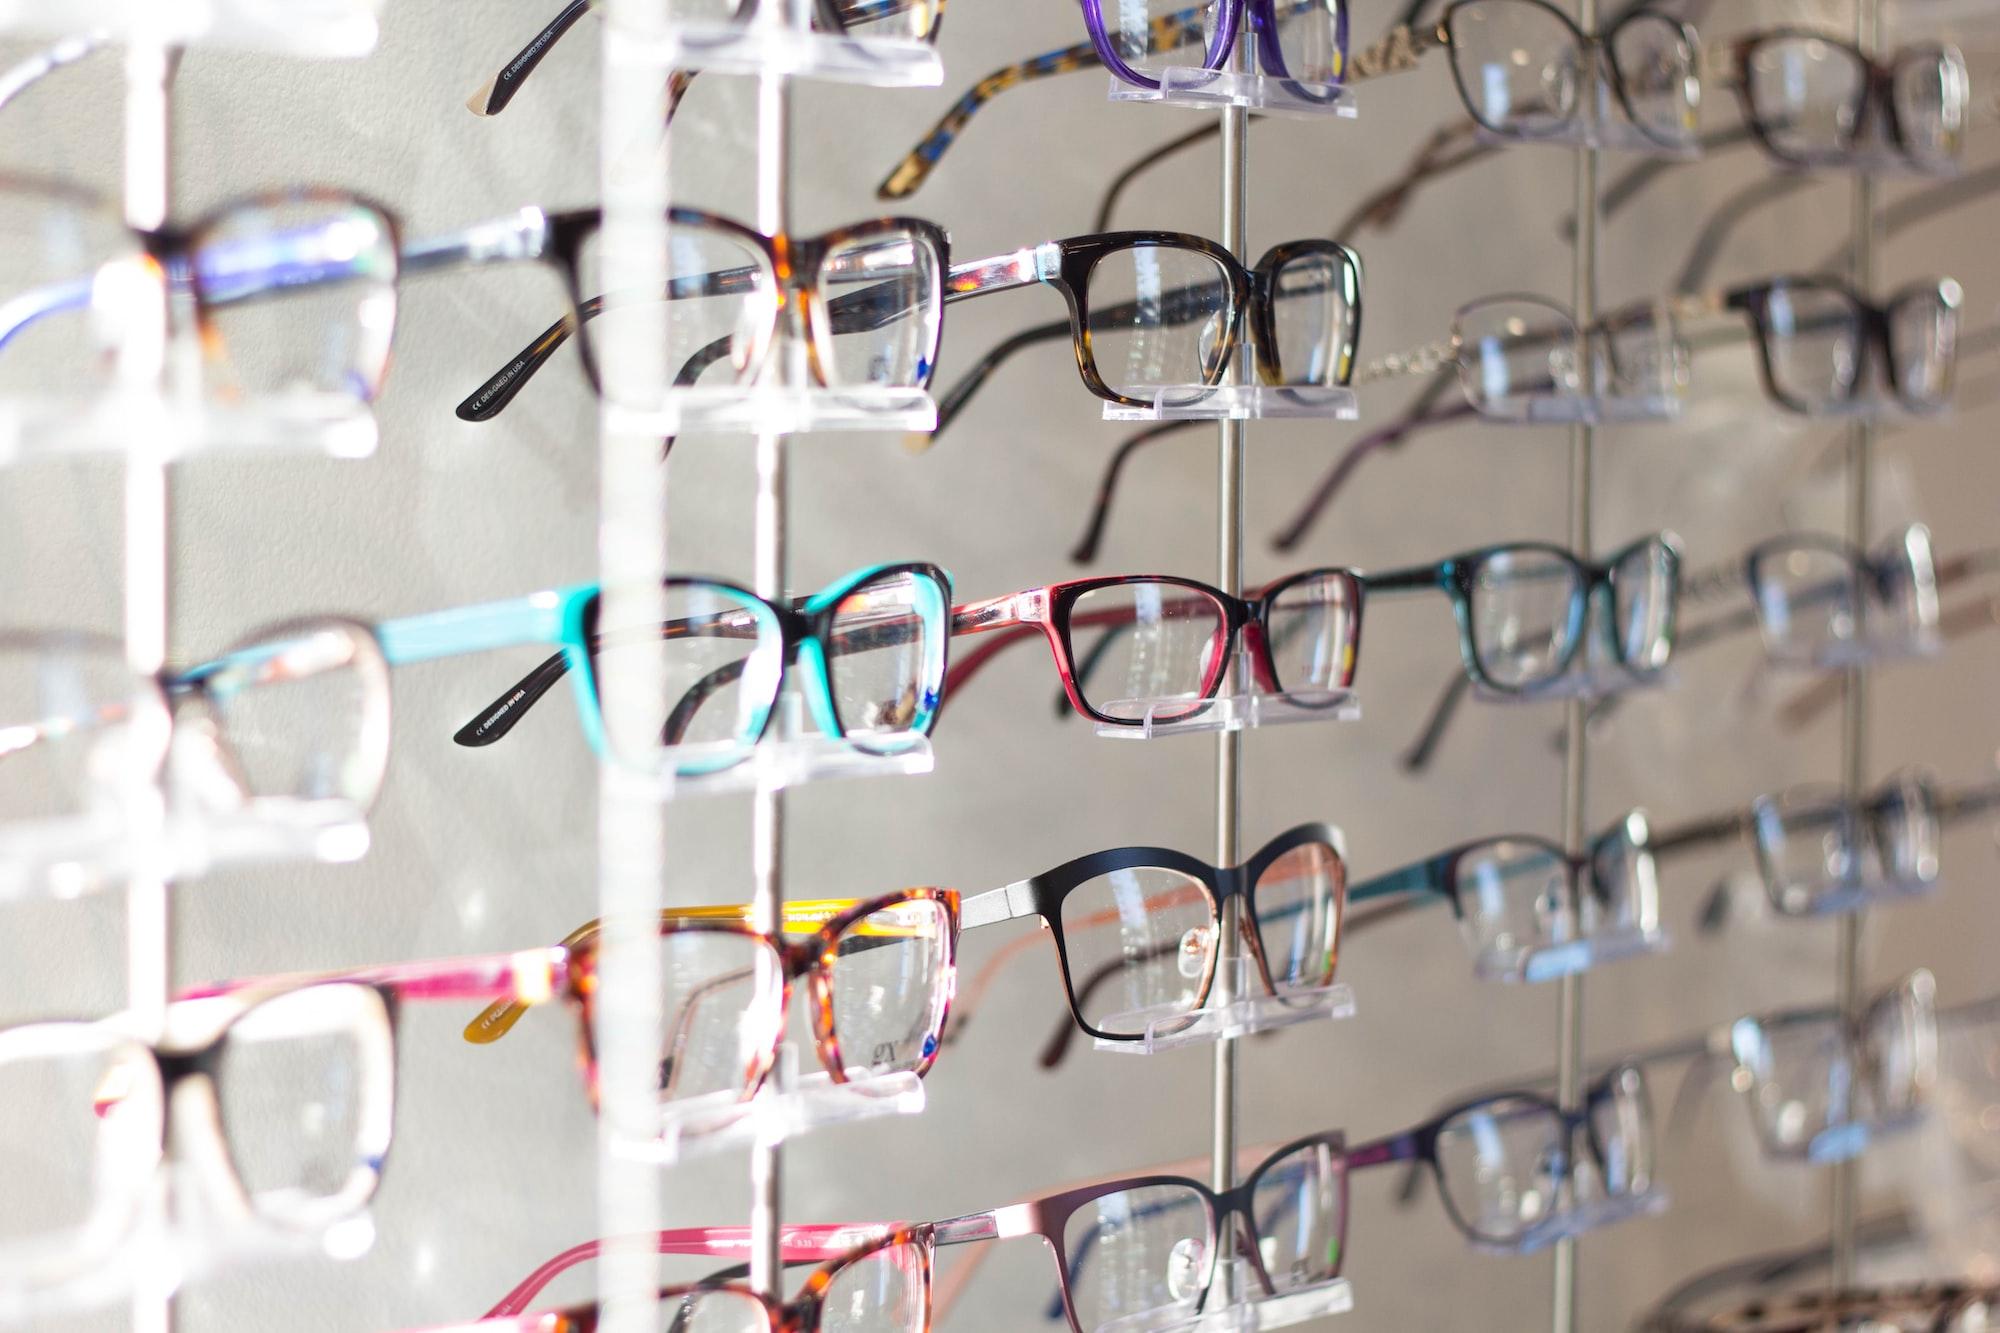 Blue light eyewear can help with computer eye strain.